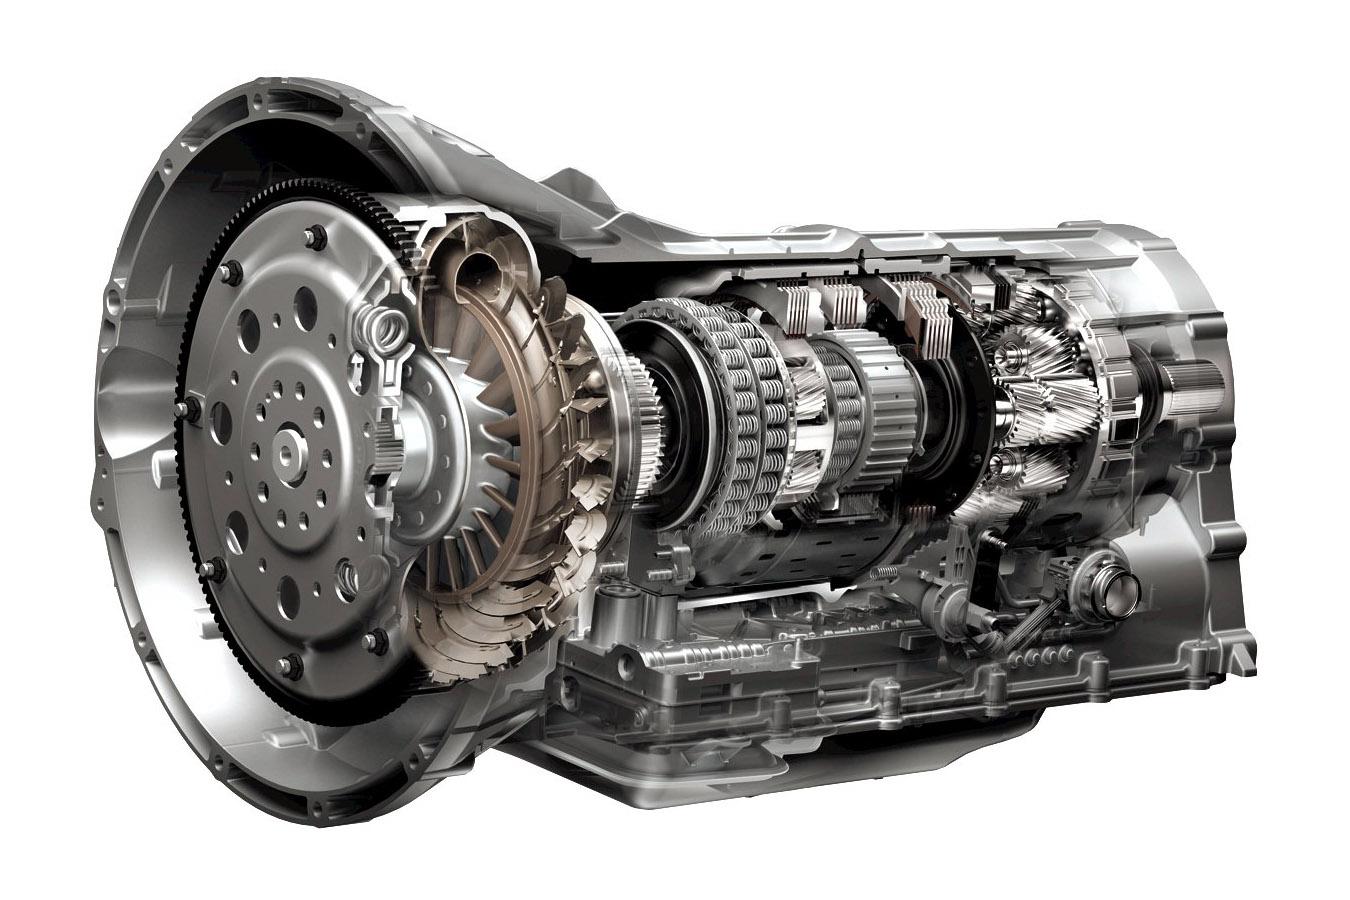 Ремонт автомобиля Opel КОРОБКА ПЕРЕДАЧ в РМ-Маркет